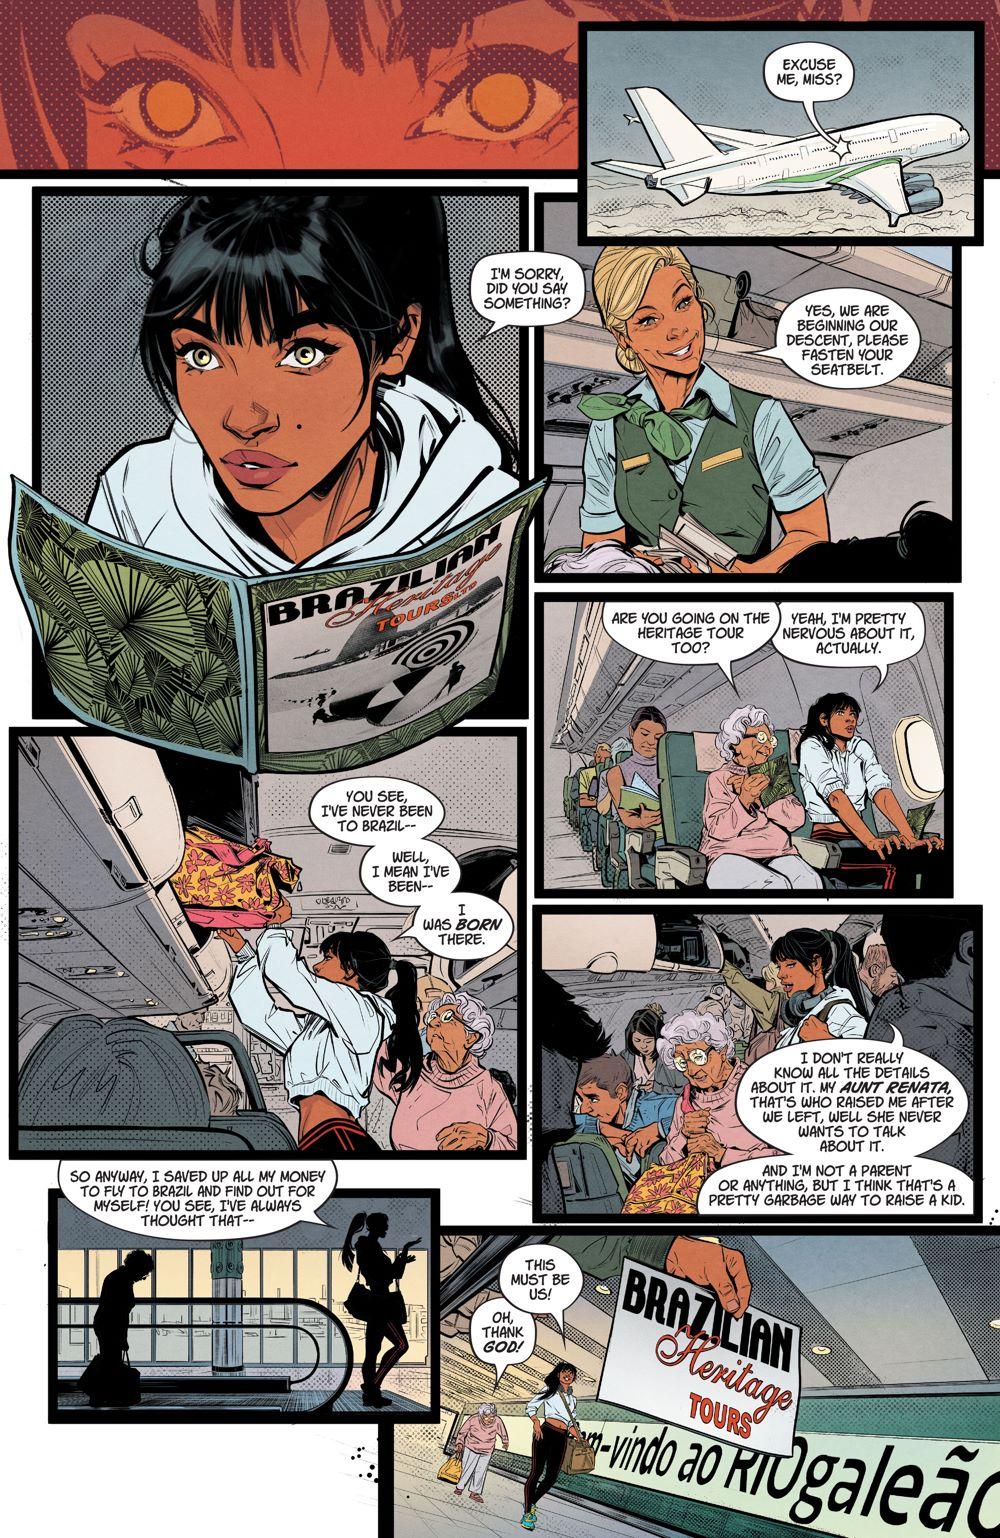 Wonder-Girl-1-8_609ddb20e3c4a1.14104912 ComicList Previews: WONDER GIRL #1